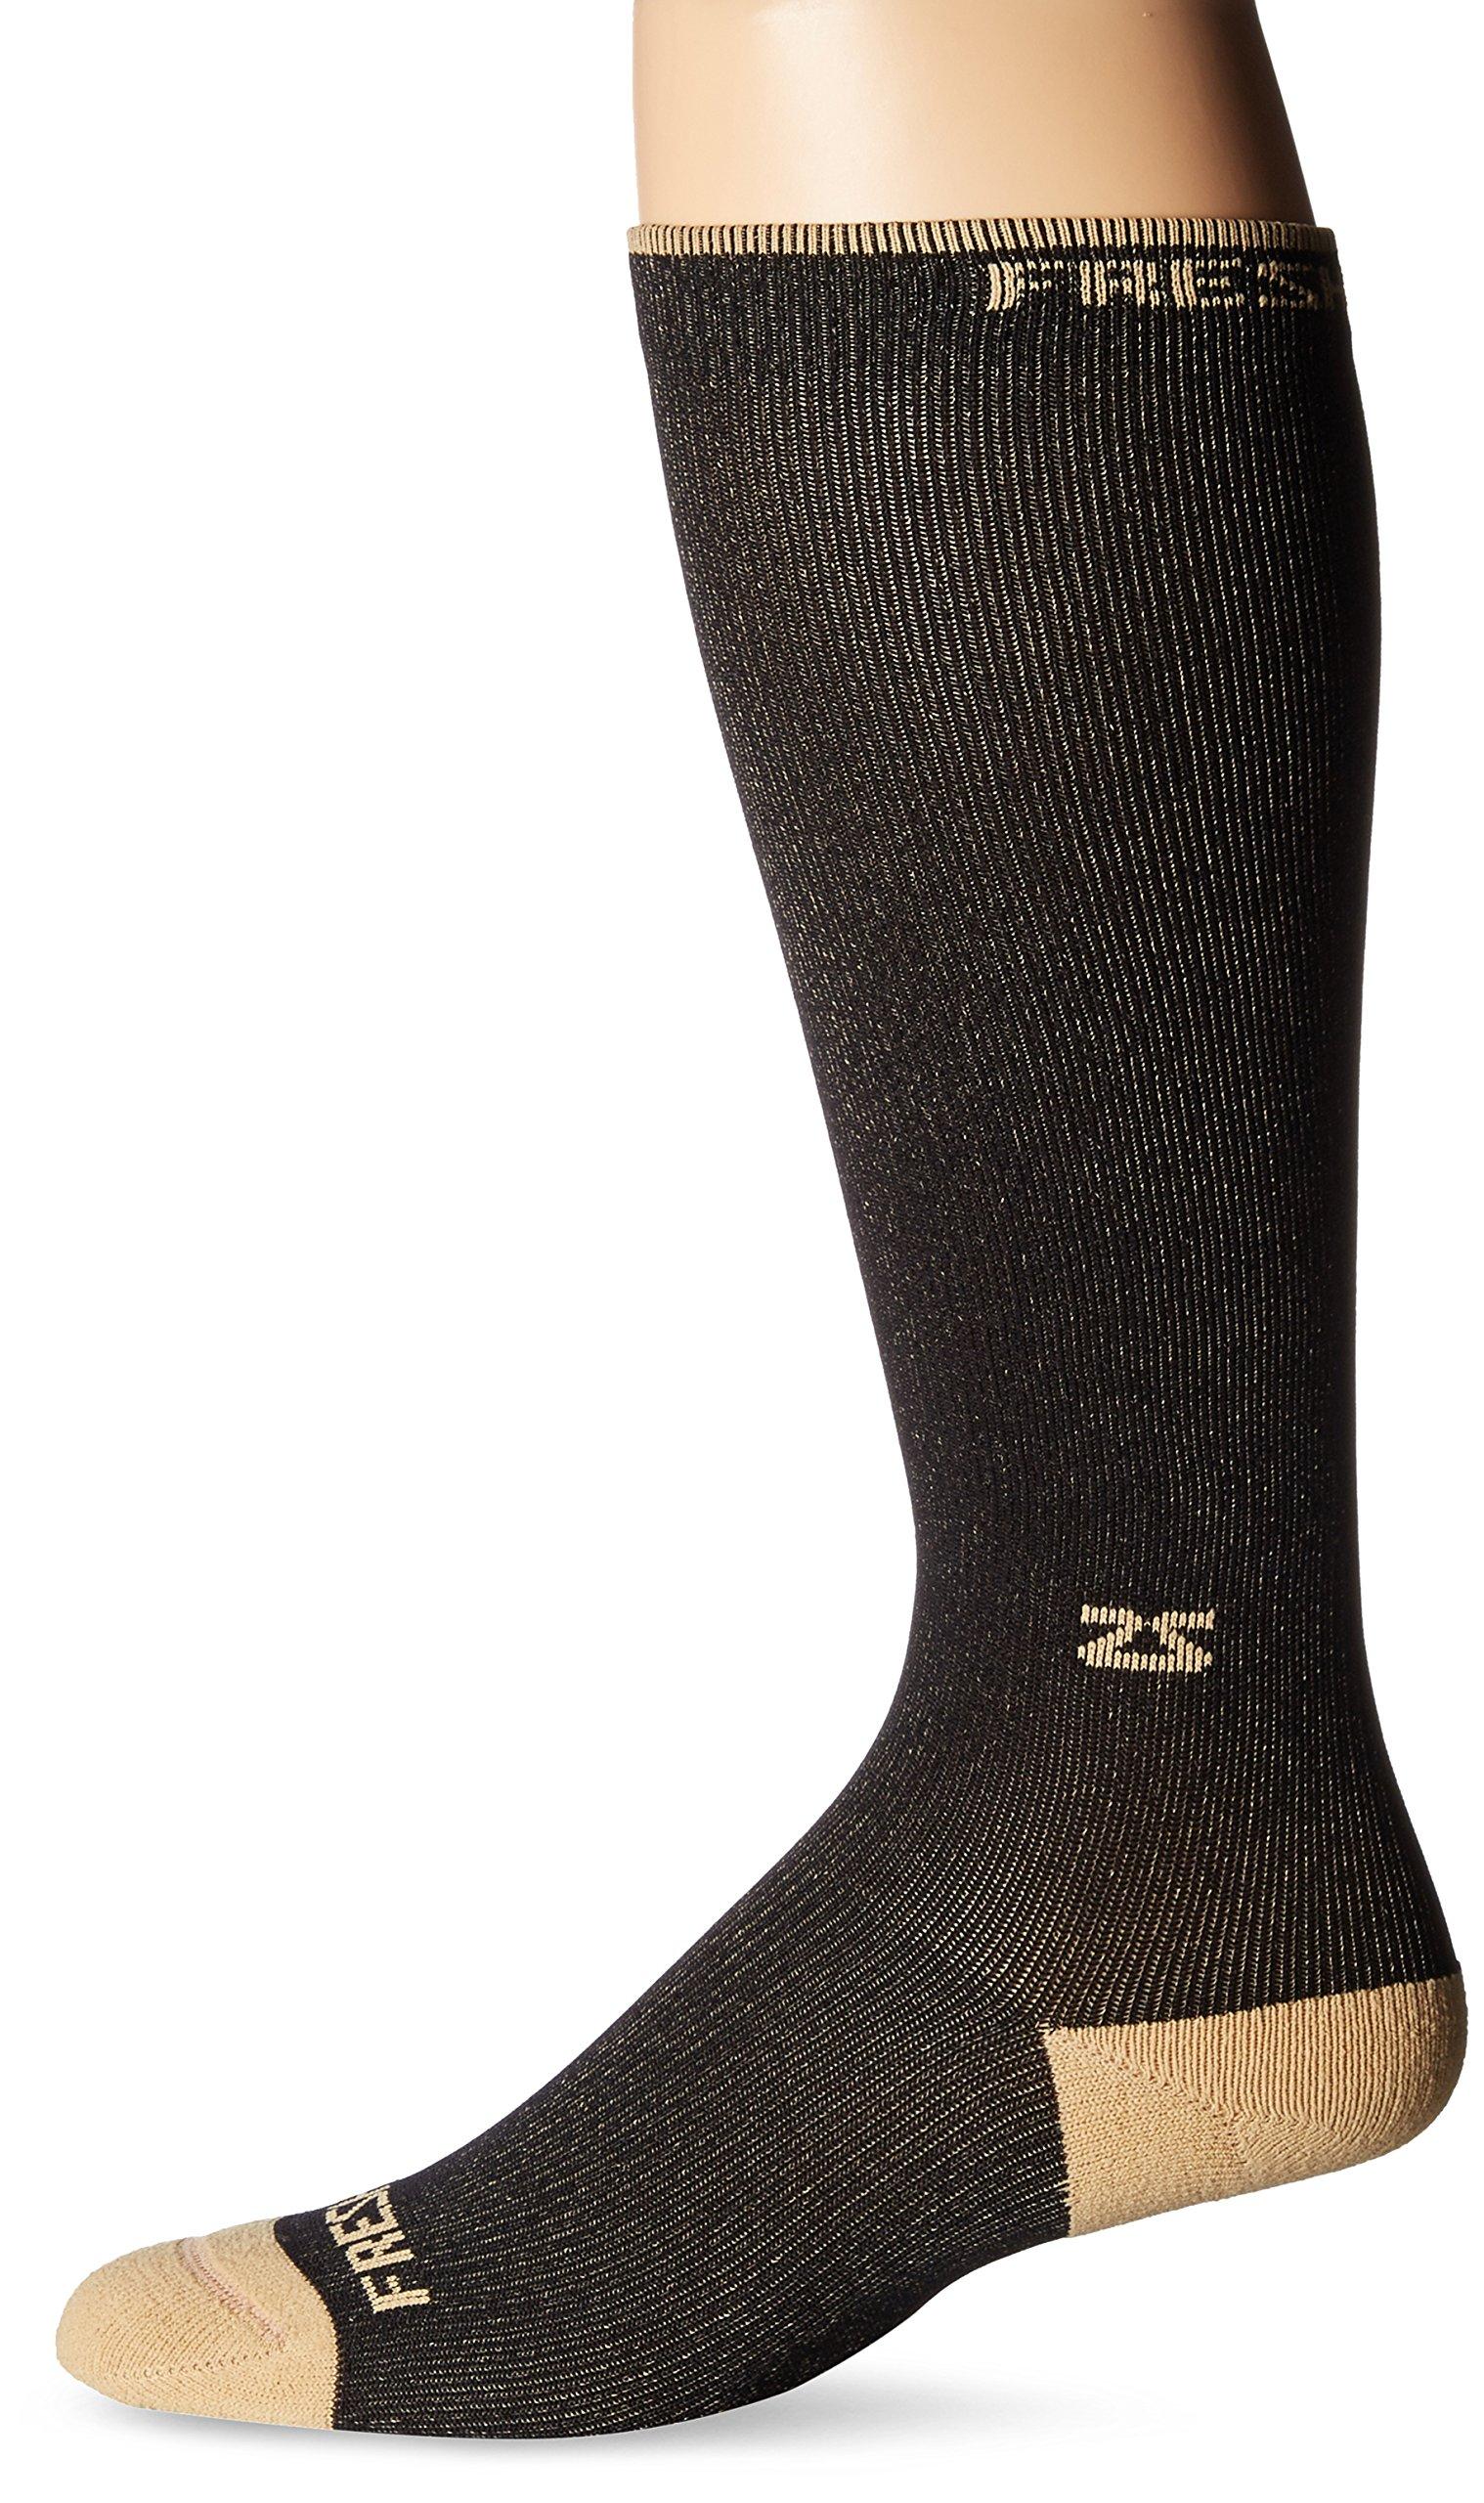 Fresh Legs Copper Compression Socks - Travel Compression Socks - Graduated Compression,M,Black